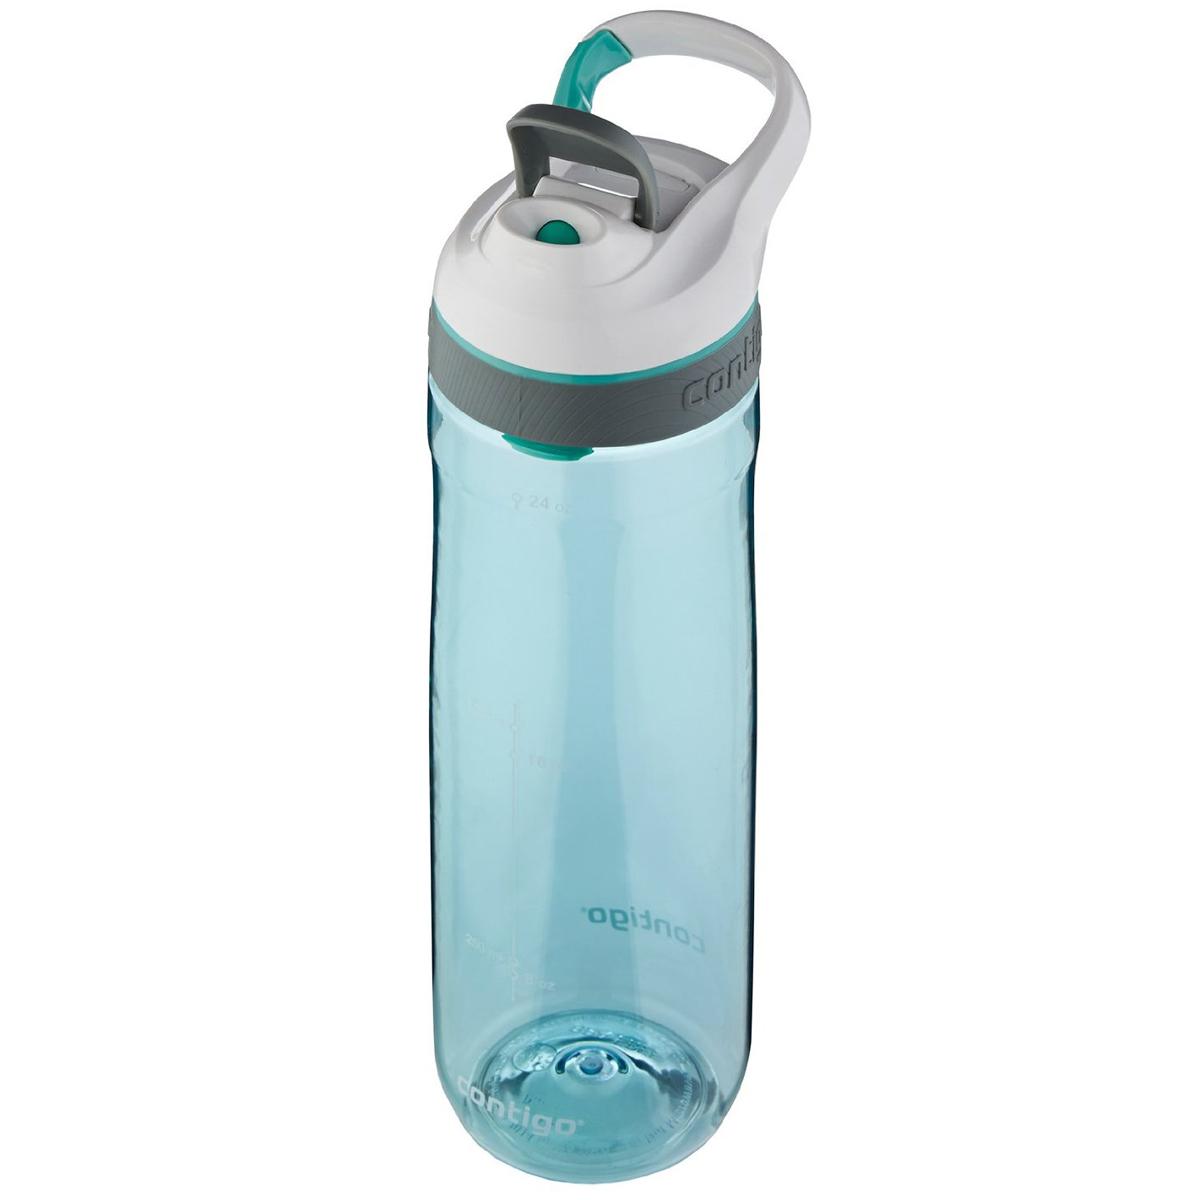 Contigo-24-oz-Cortland-Autoseal-Water-Bottle miniatuur 5